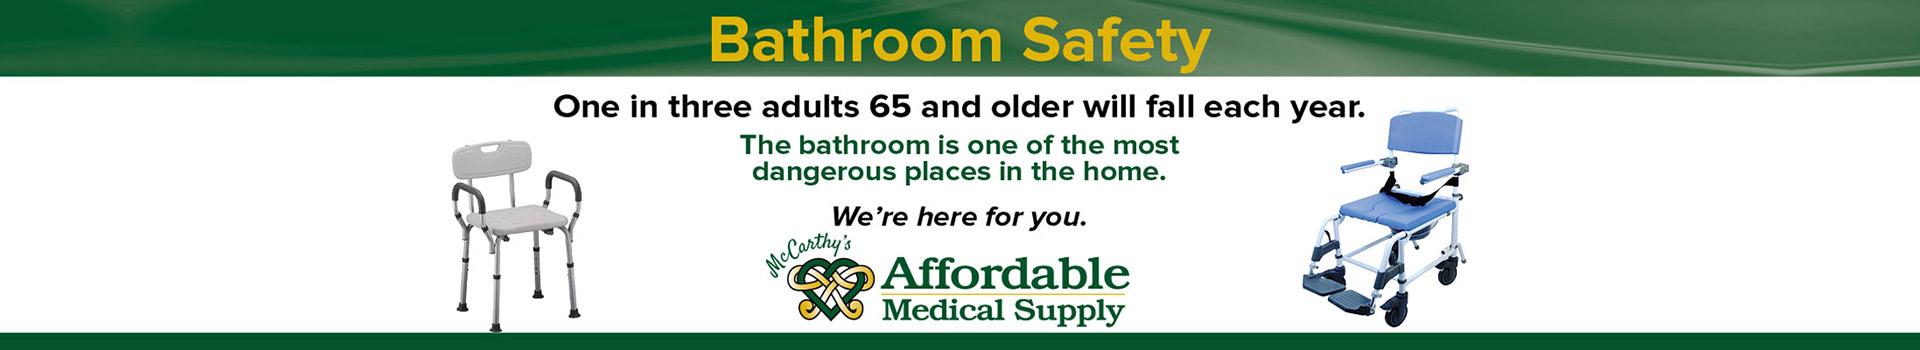 bathroom-safety-1-banner